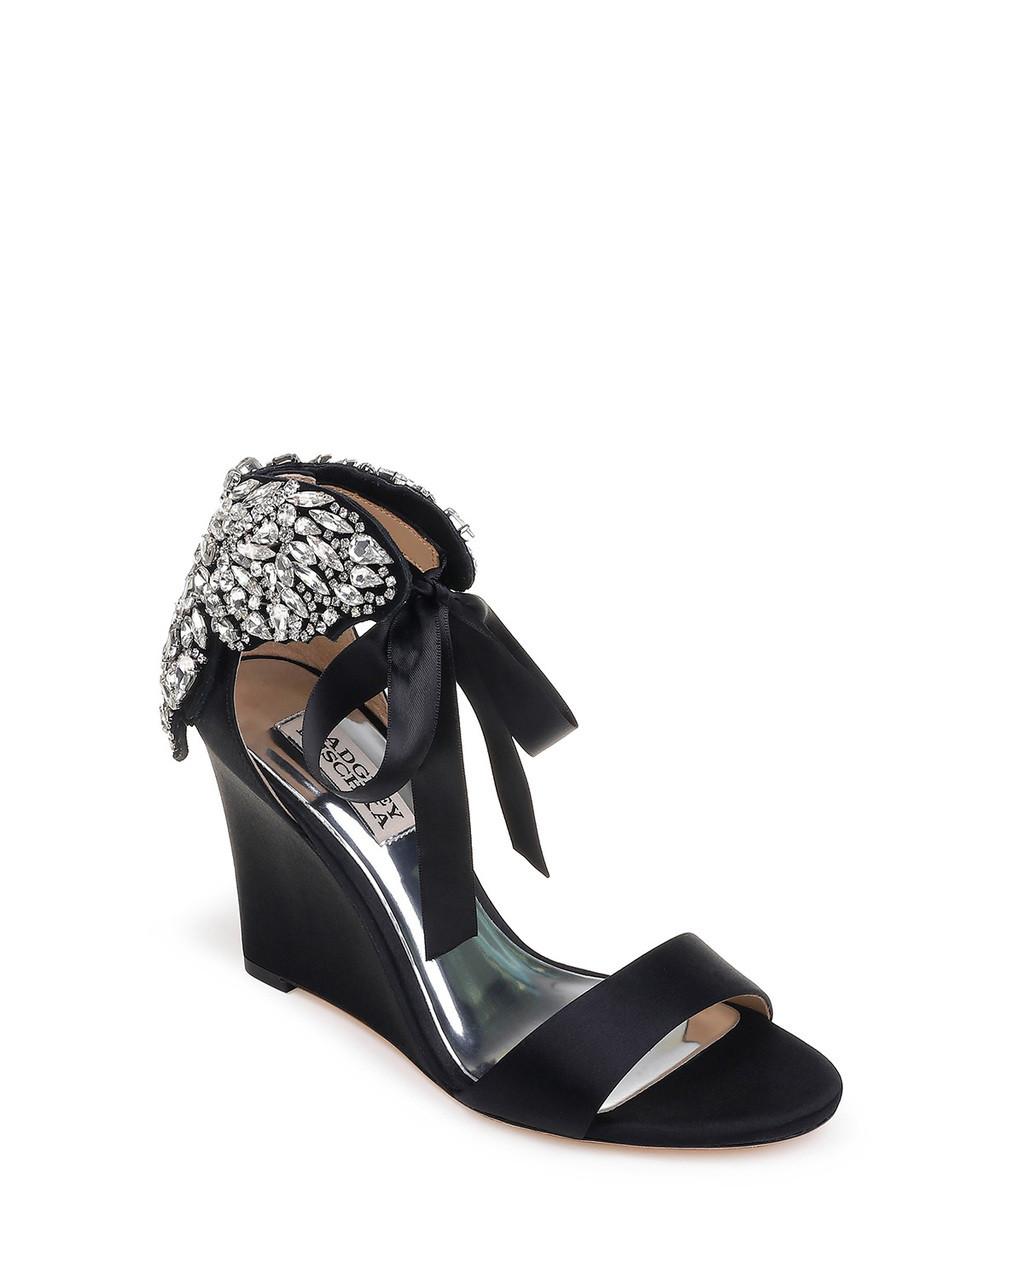 858f853e8f6 Heather Embellished Wedge Evening Shoe by Badgley Mischka